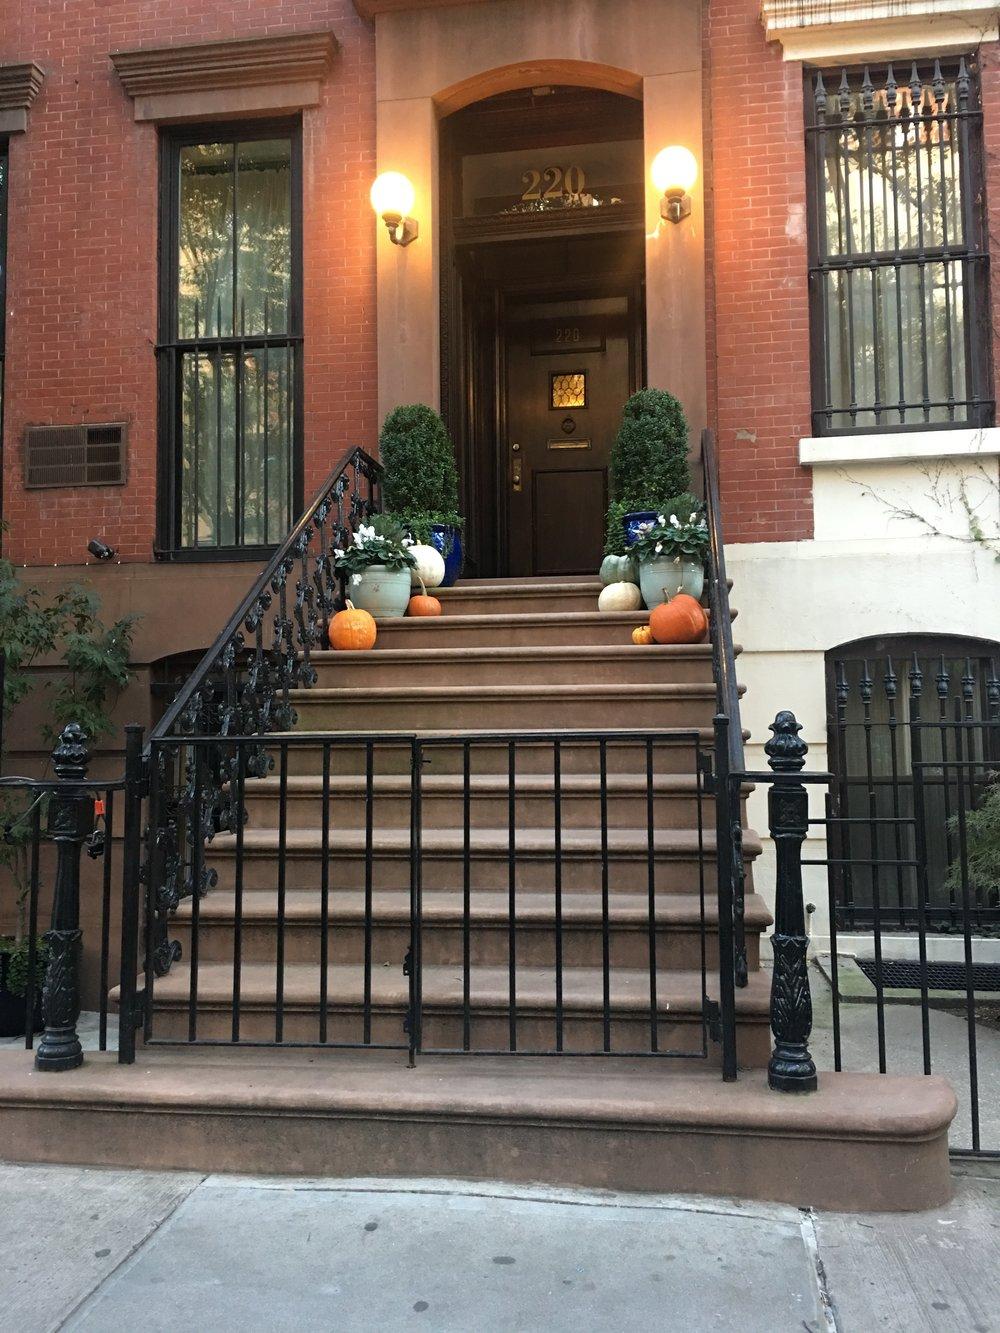 Brownstone house with pumpkins.jpg